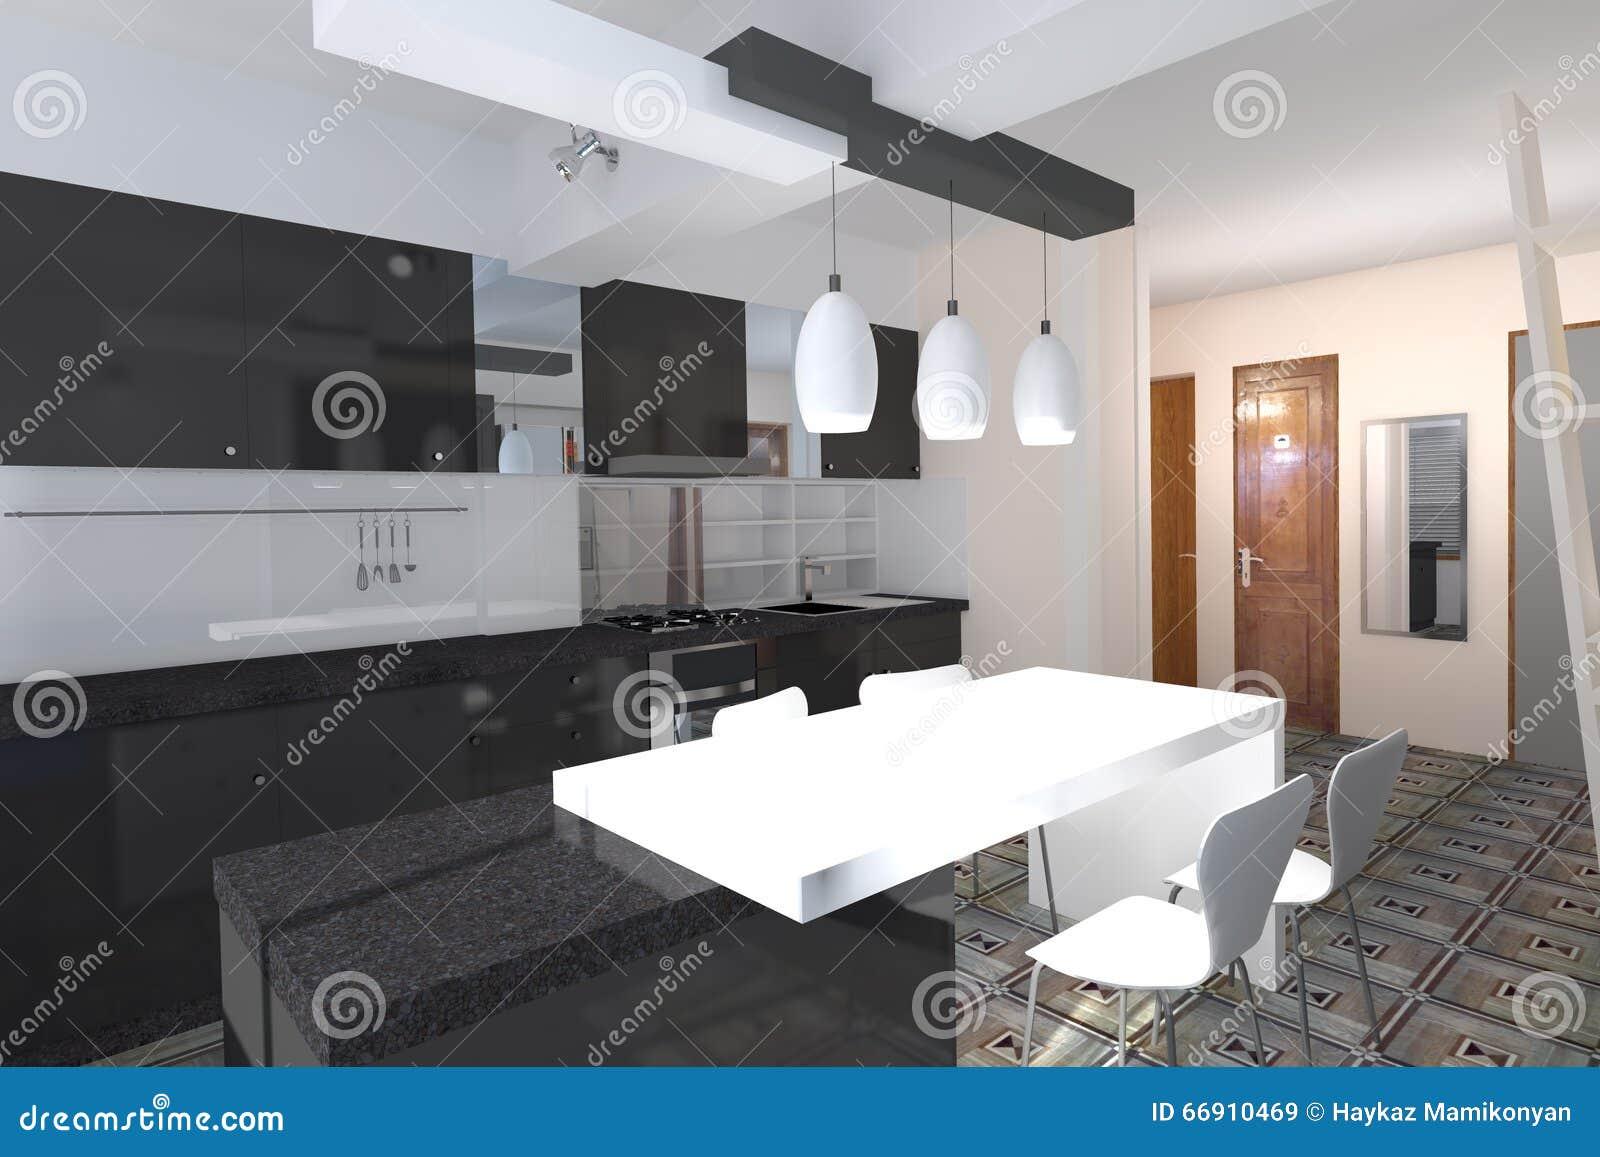 Kitchen Design Stock Illustration Image 66910469